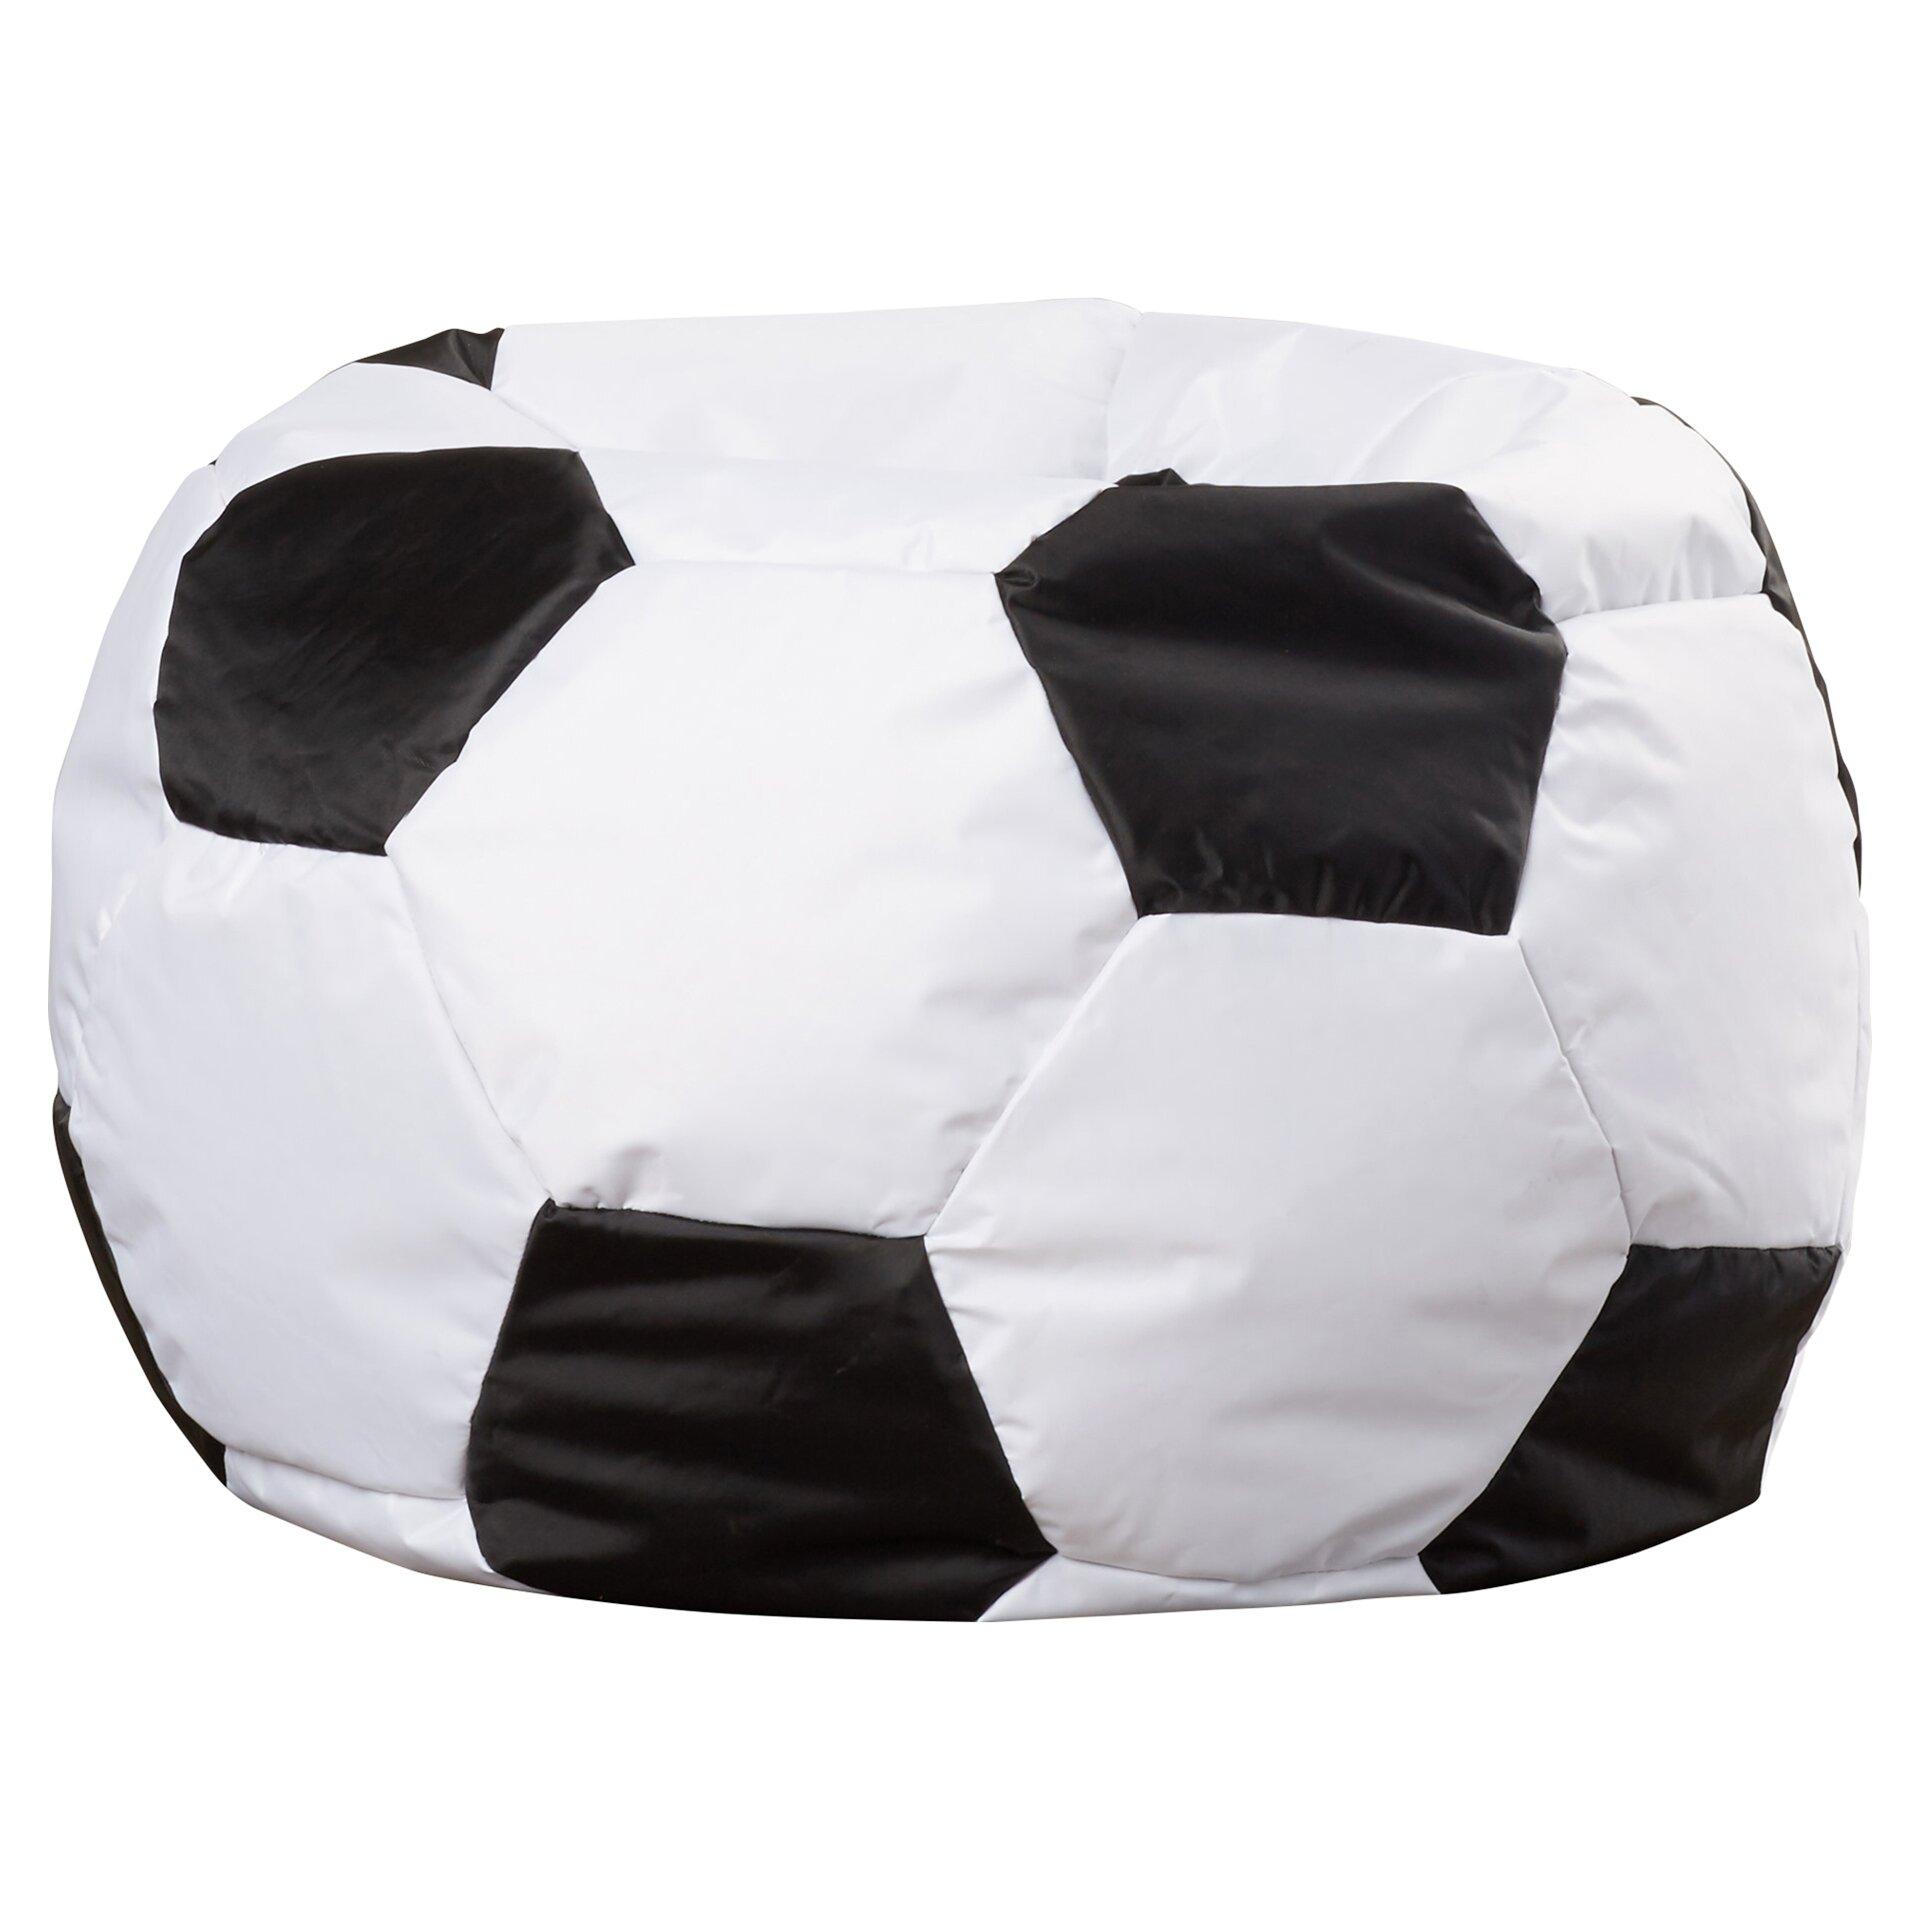 Big joe lumin chair - Big Joe Lumin Chair Black Big Joe Soccer Bean Bag Chair